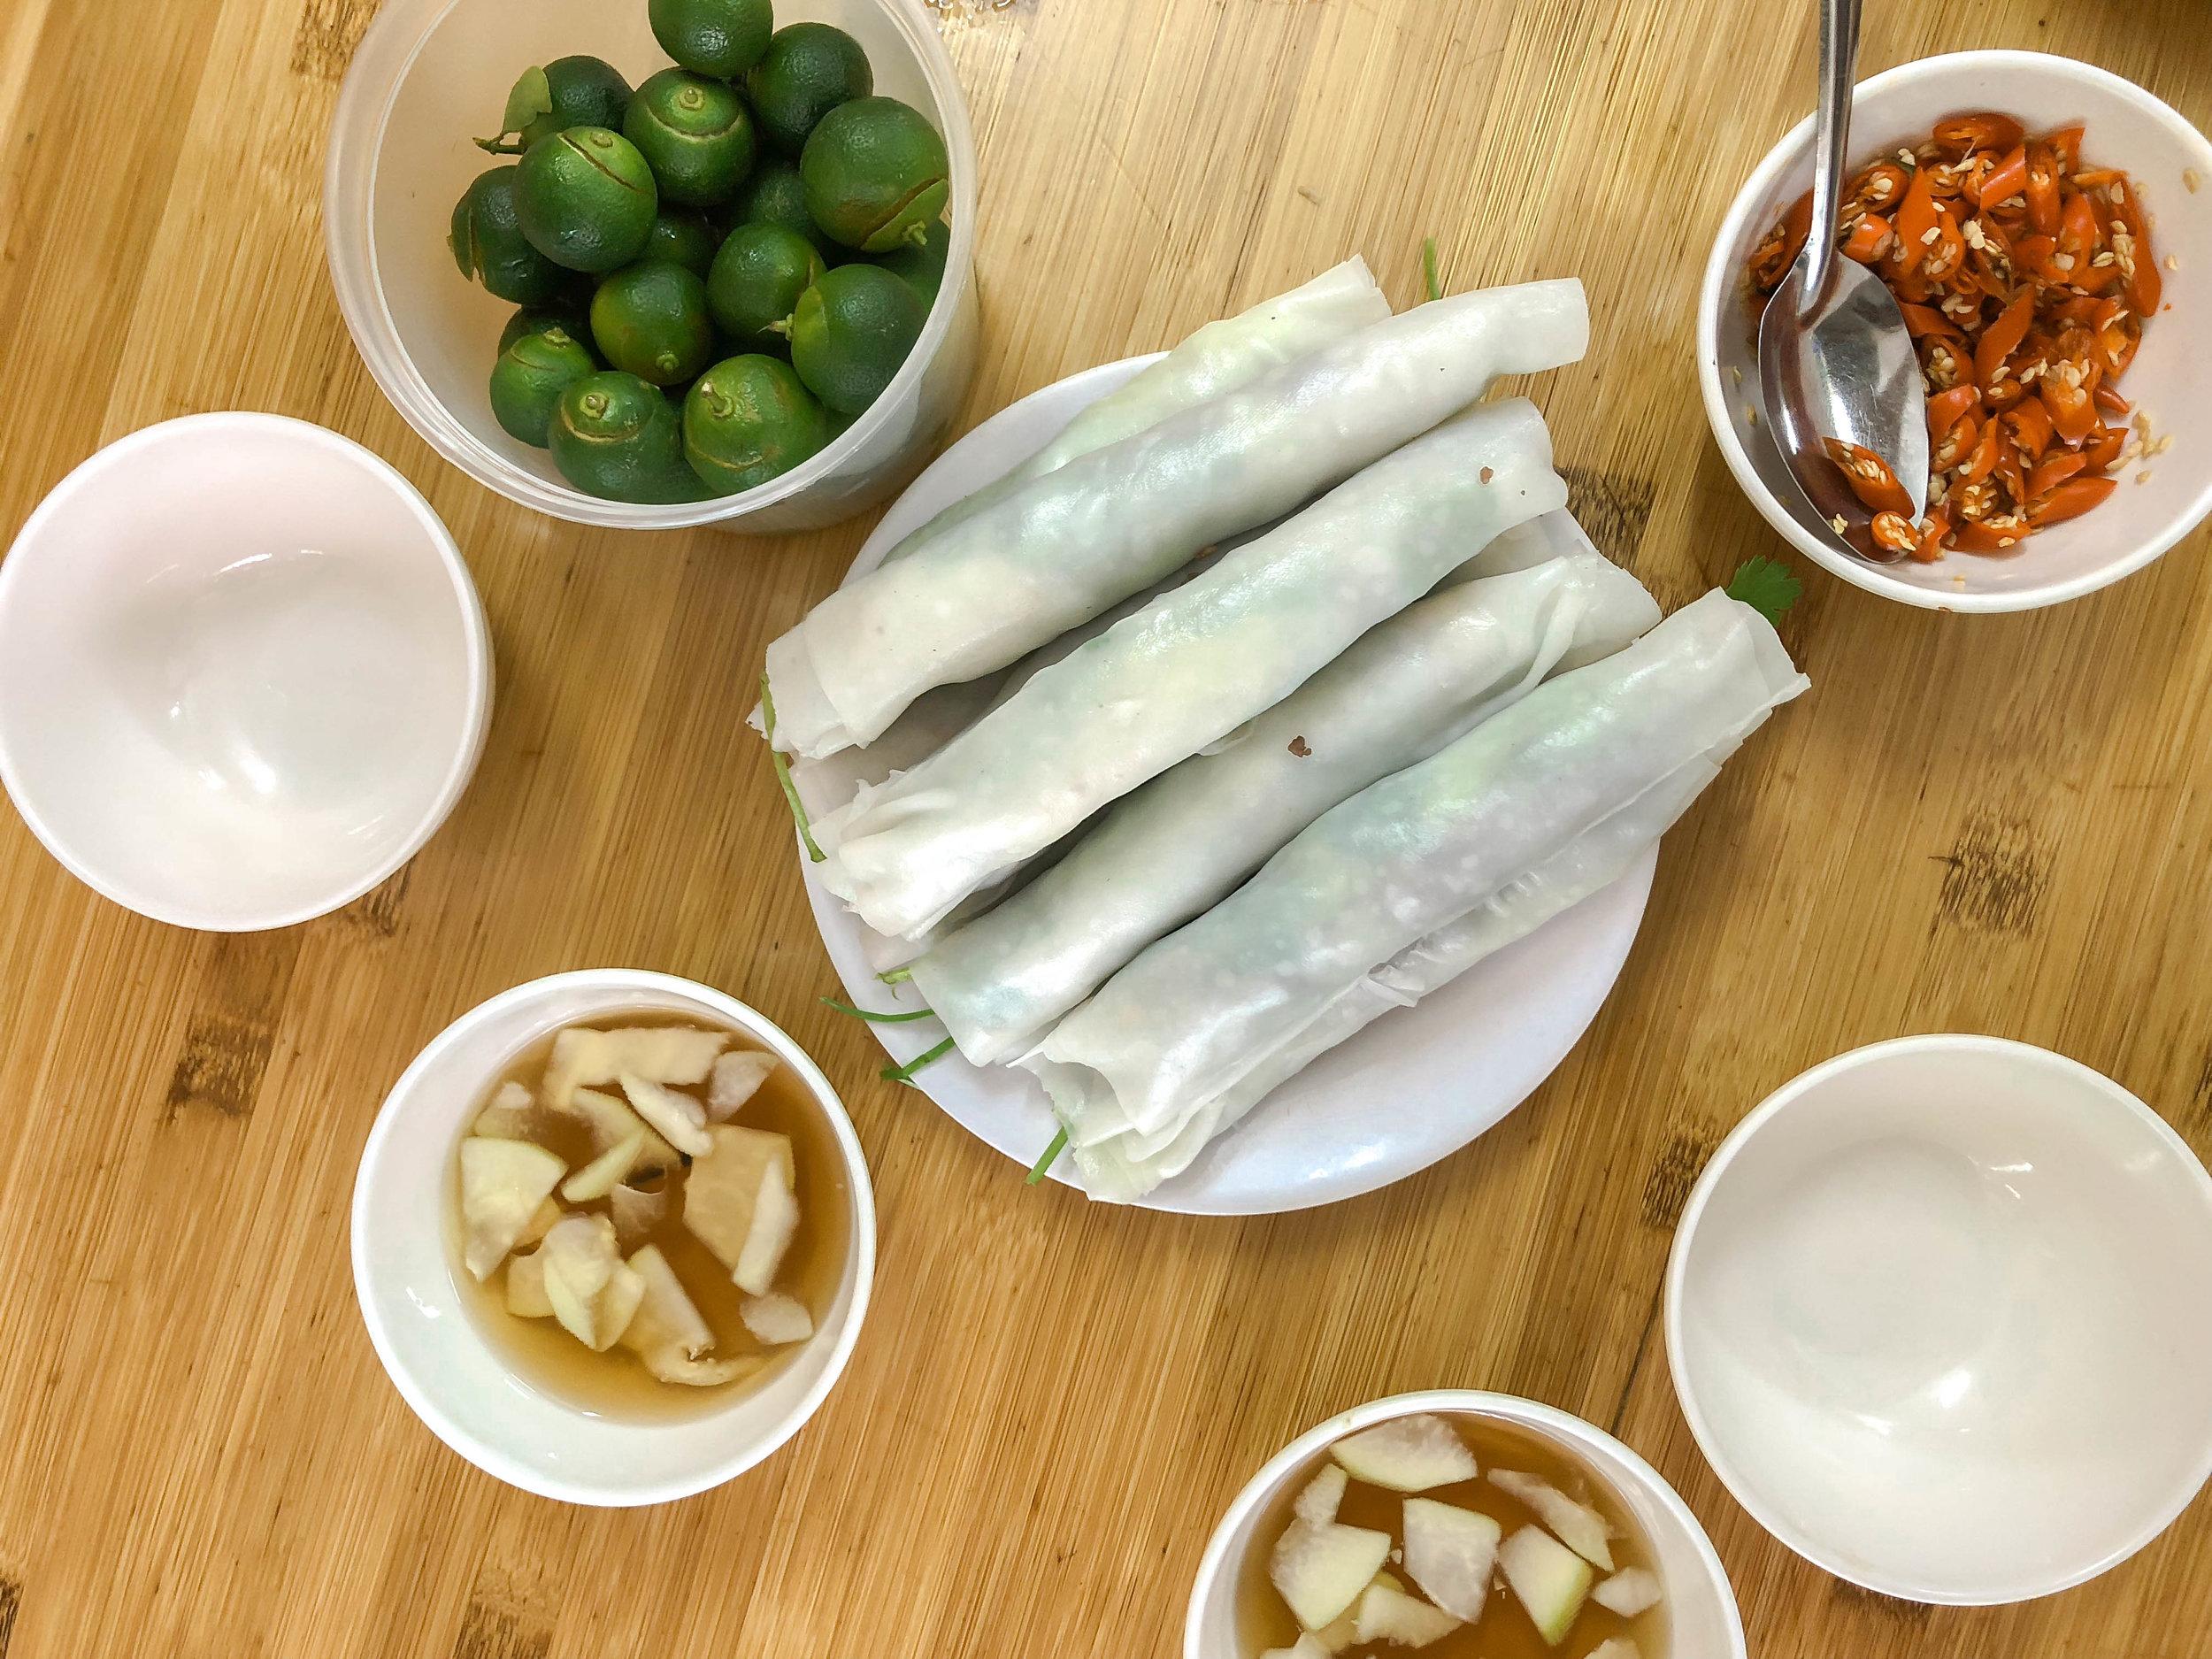 Hanoi Food Guide   8 Foods You Must Try in Hanoi, Vietnam